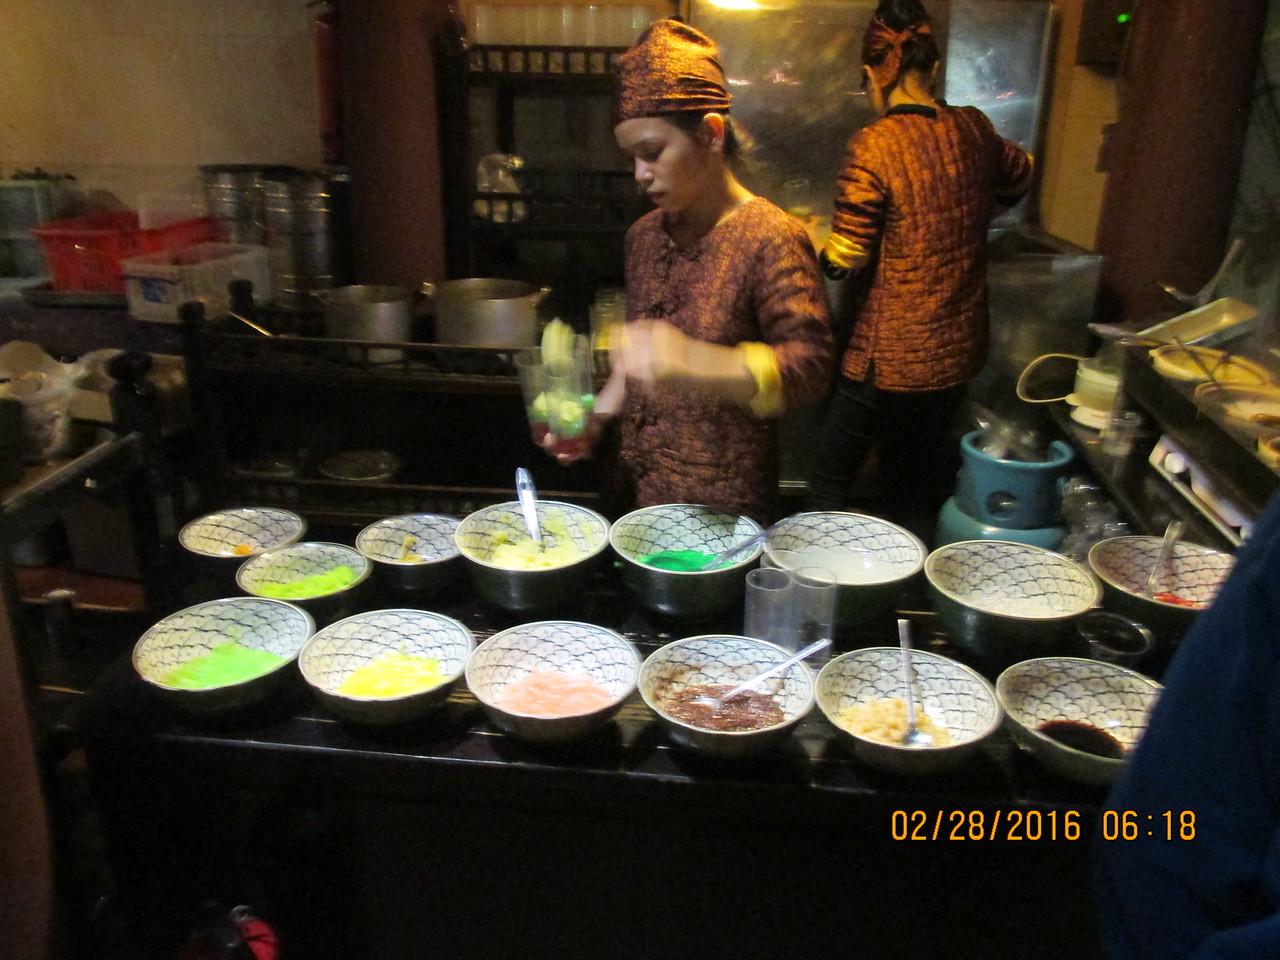 0069 - Quan An Ngon Restaurant on Phan Boi Chau - Hanoi Vietnam - Date Correct but Time on Pic is Wrong